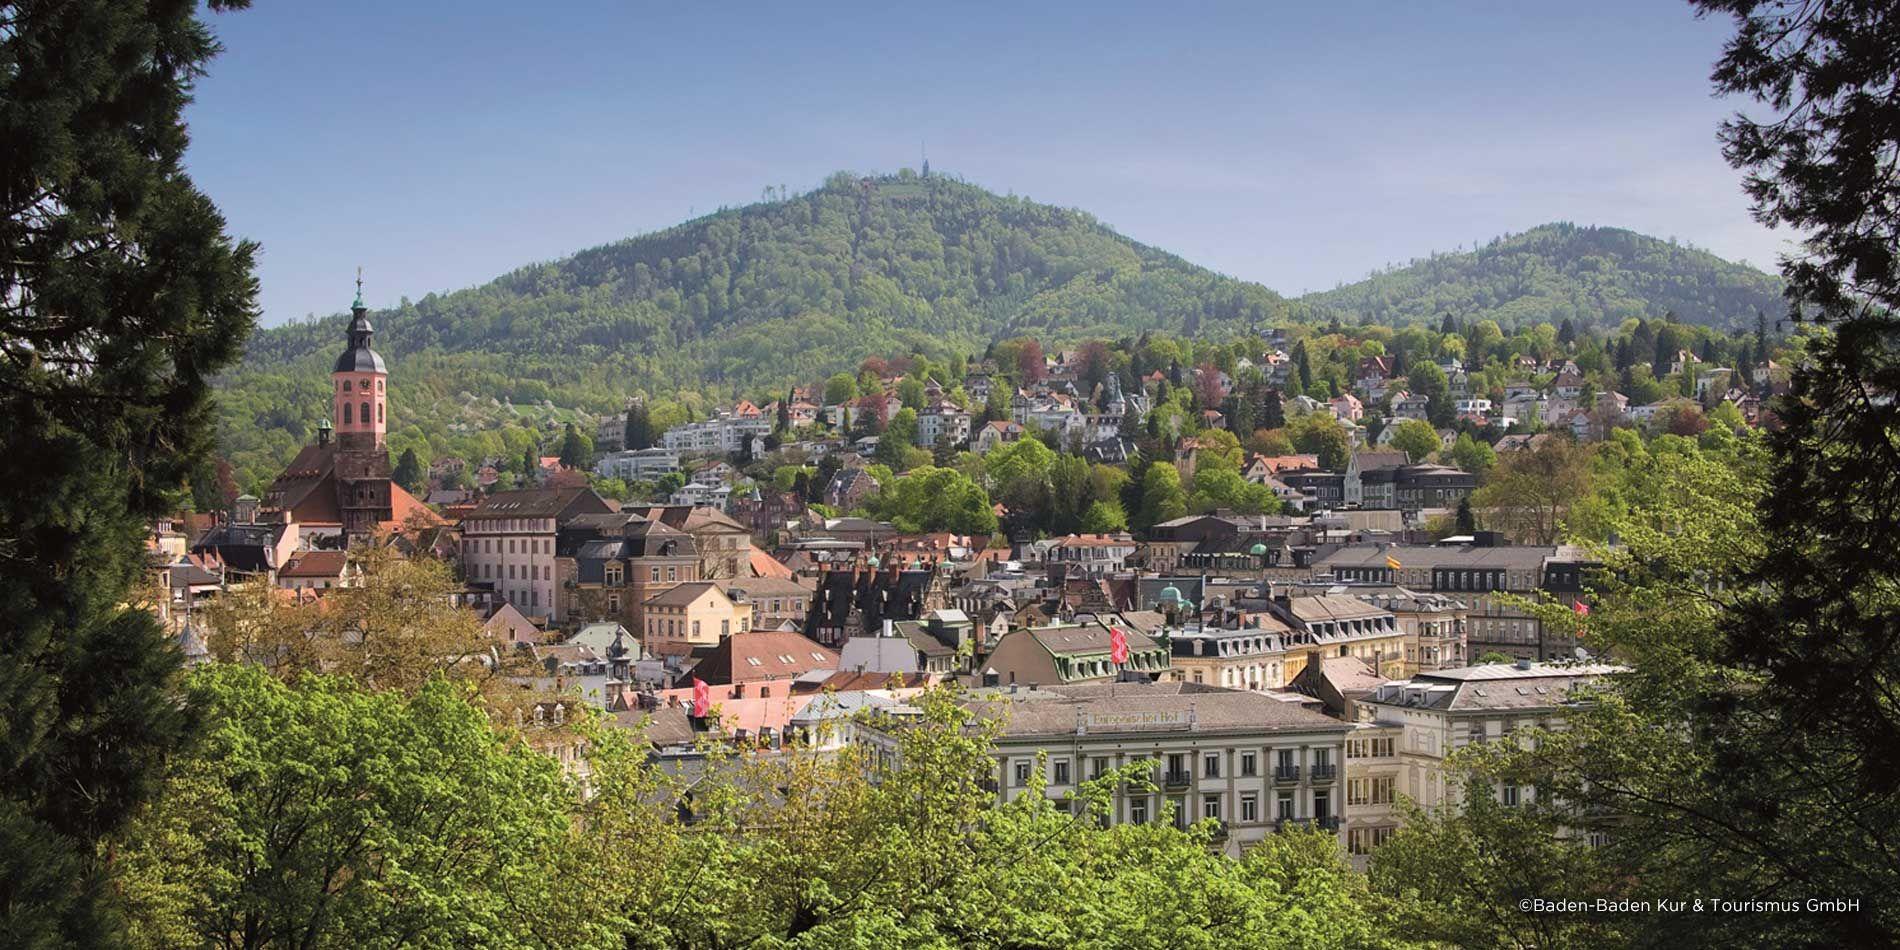 © Baden-Baden Kur & Tourismus GmbH